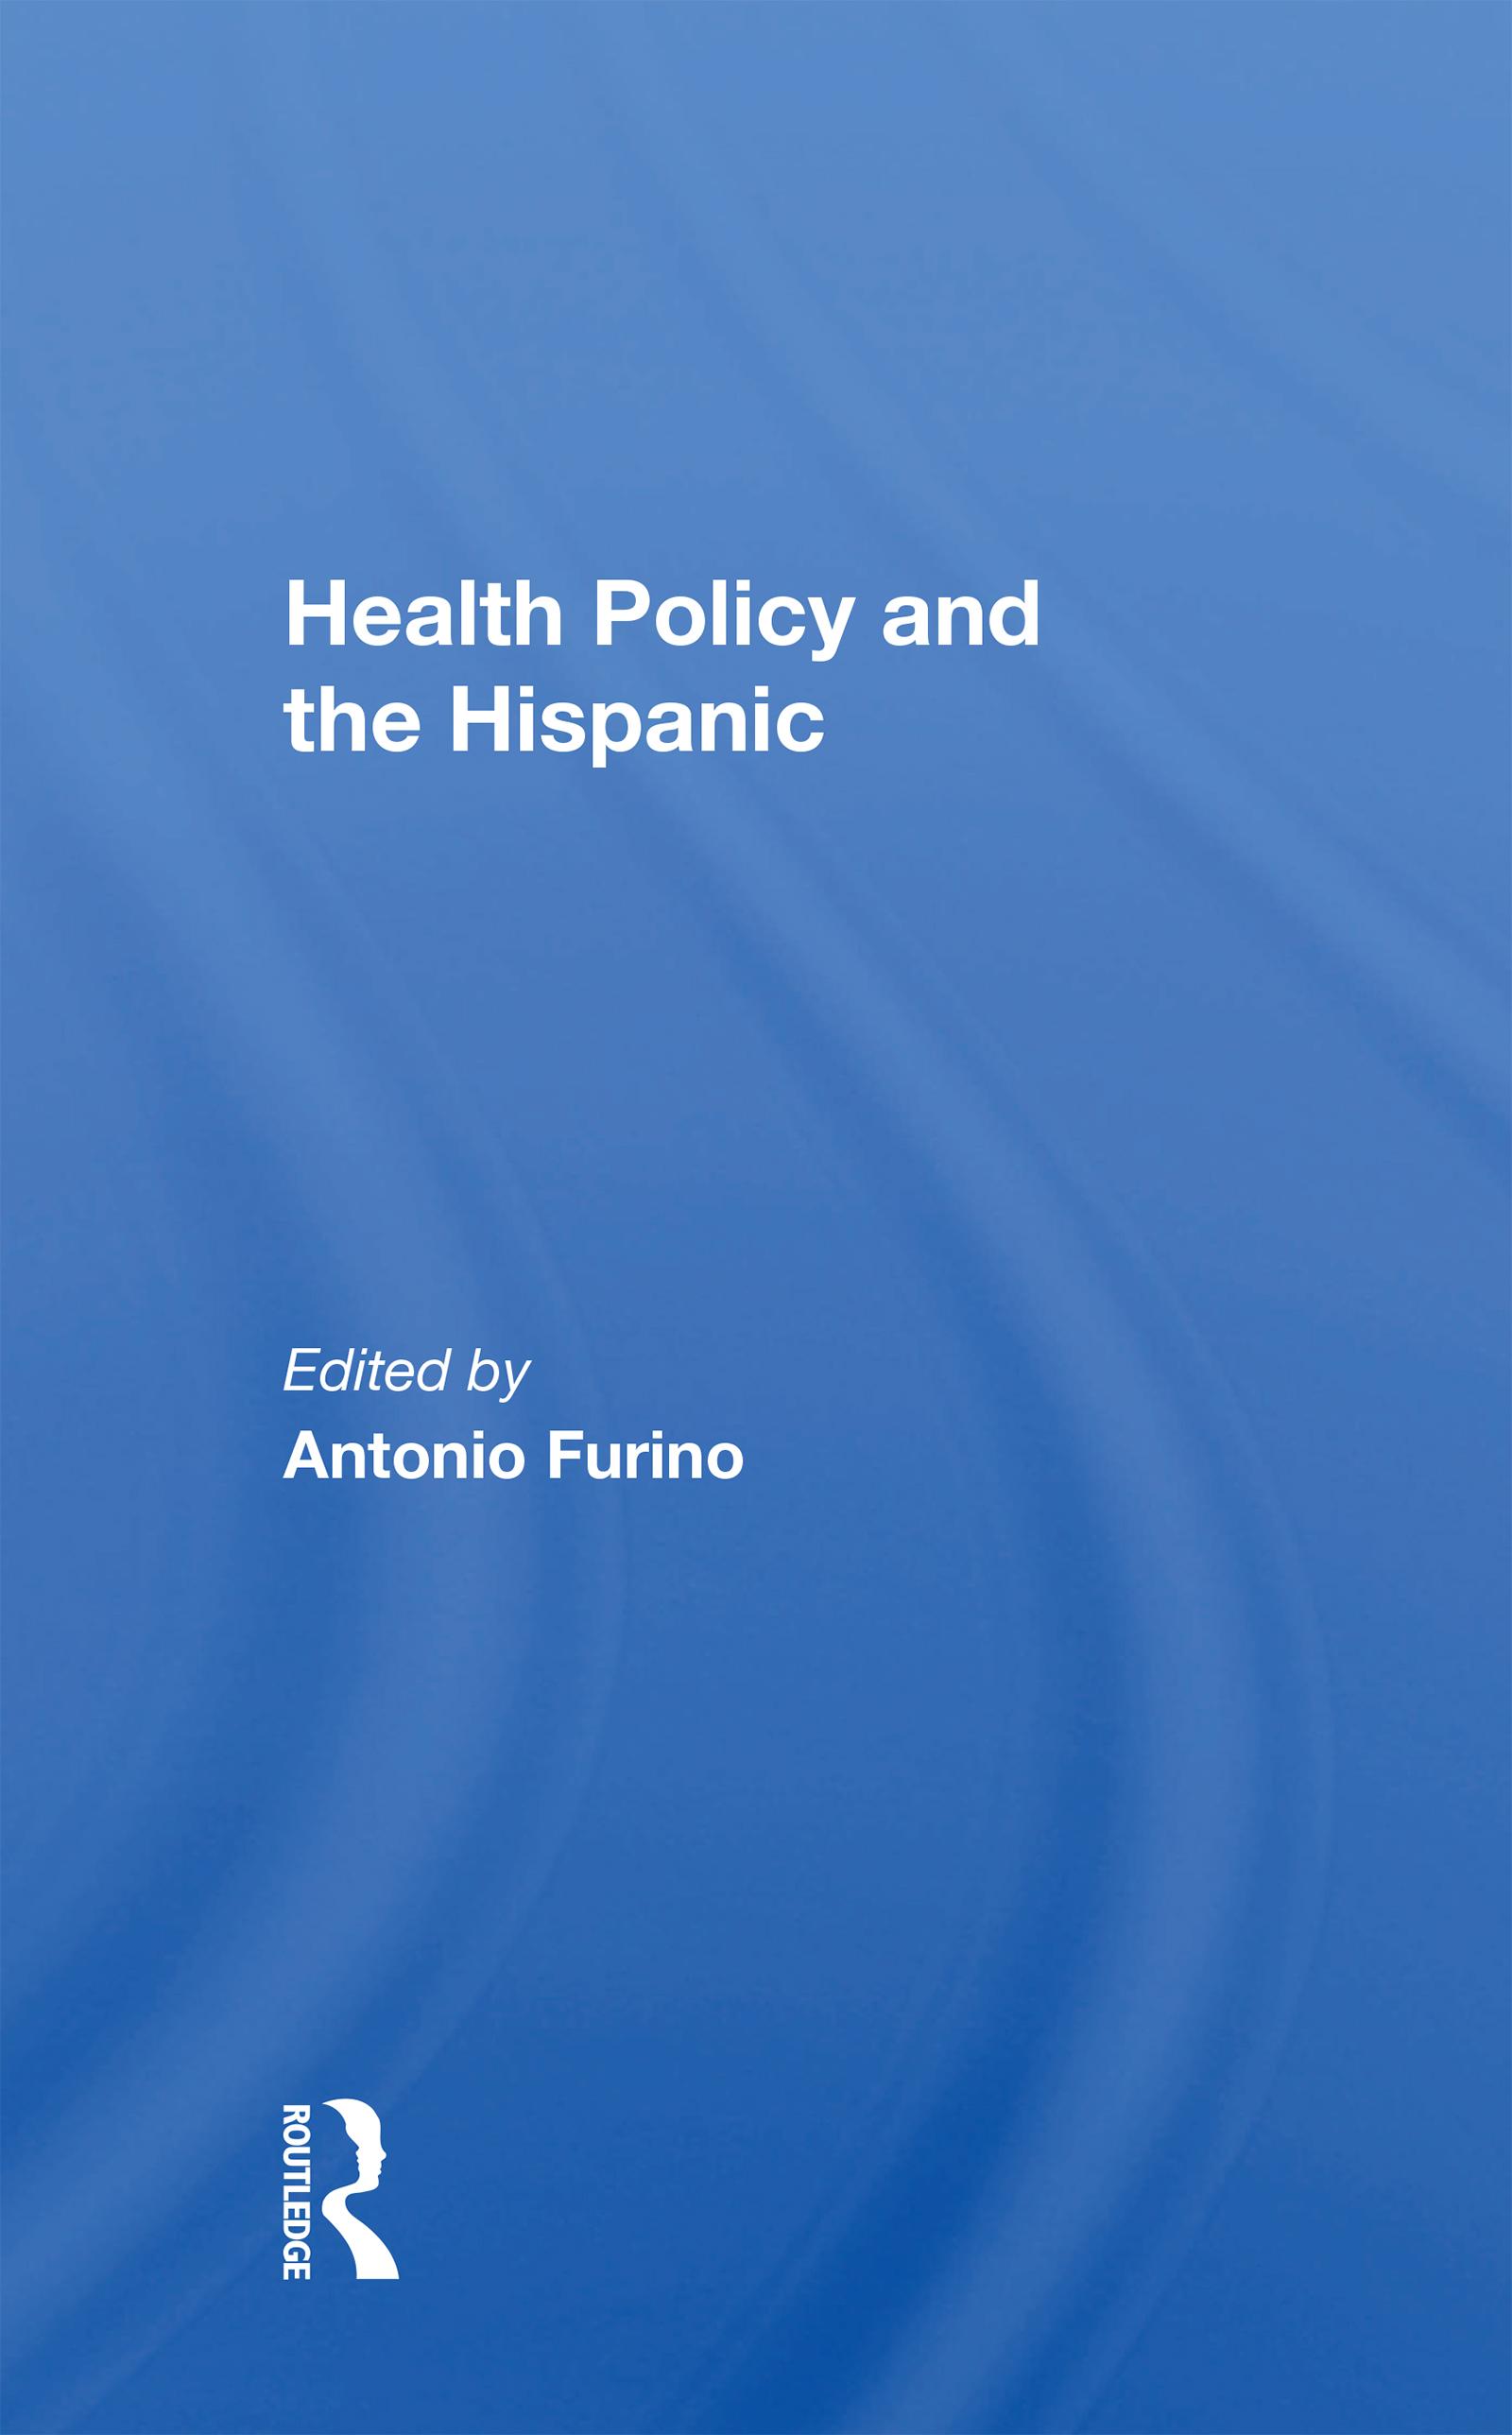 Health Policy and the Hispanic